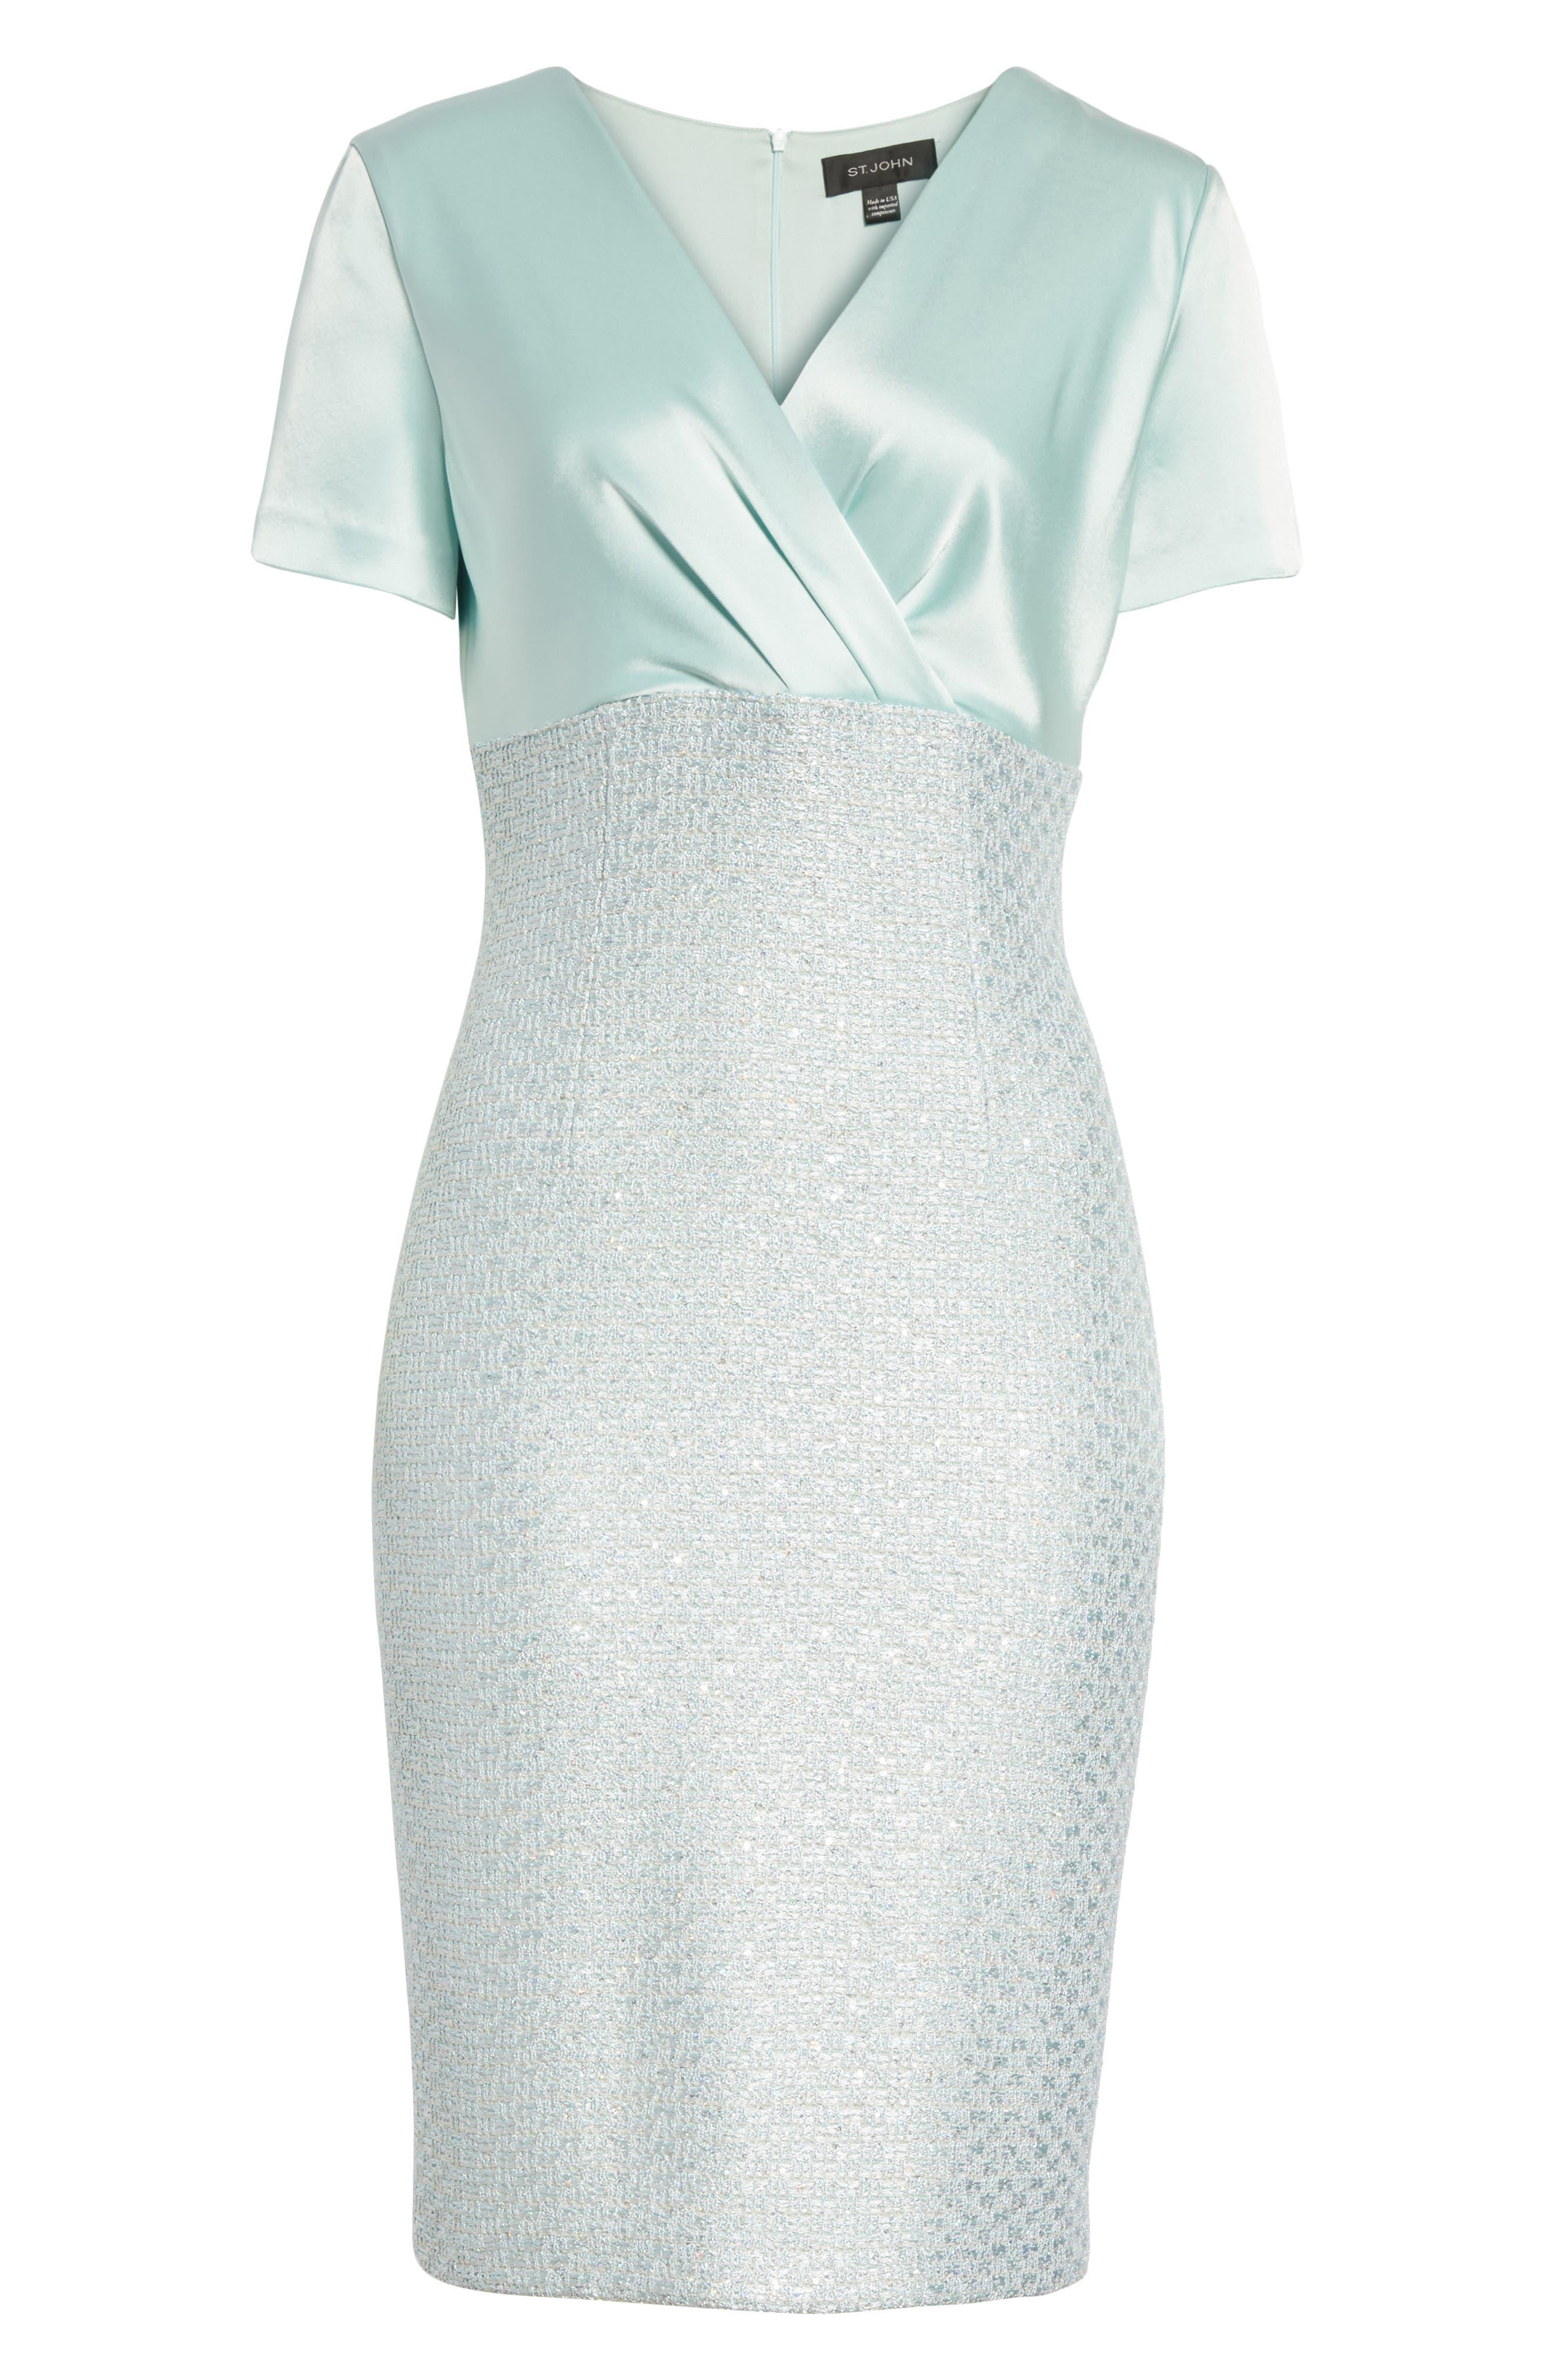 Hansh Satin & Knit Sheath Dress,                             Alternate thumbnail 6, color,                             440